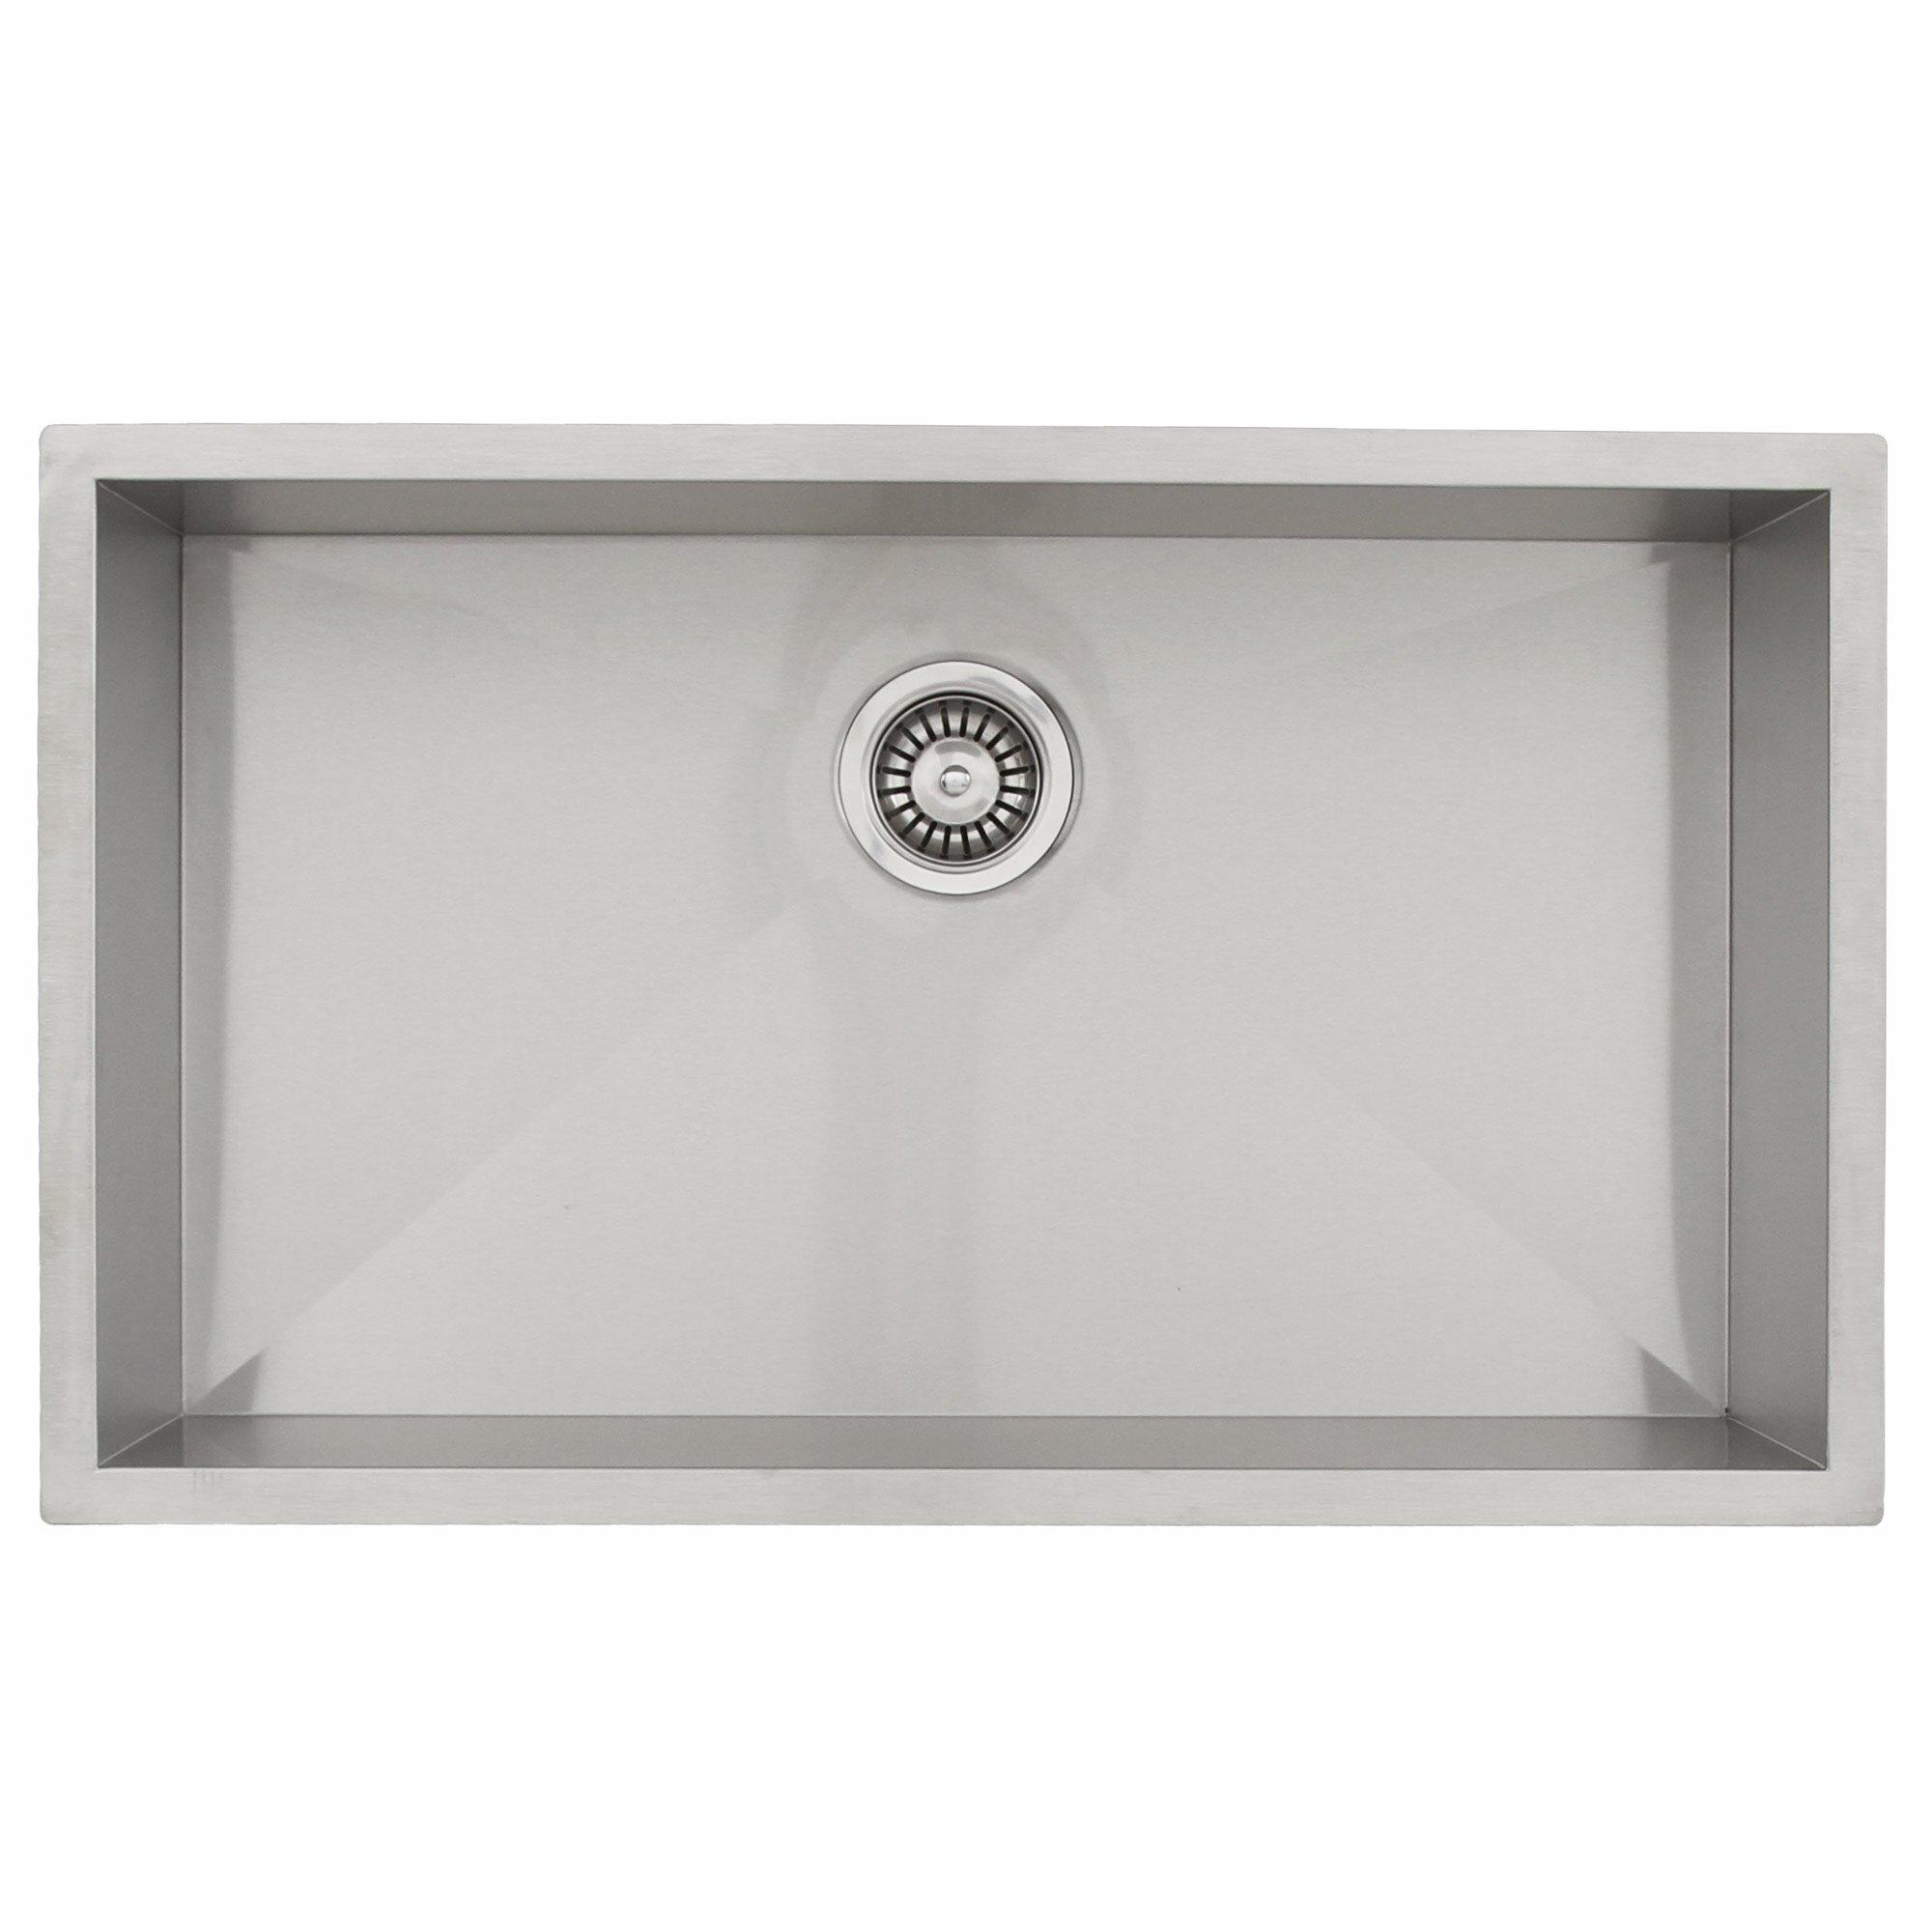 Ticor Sinks : Ticor Sinks Zero Radius 30